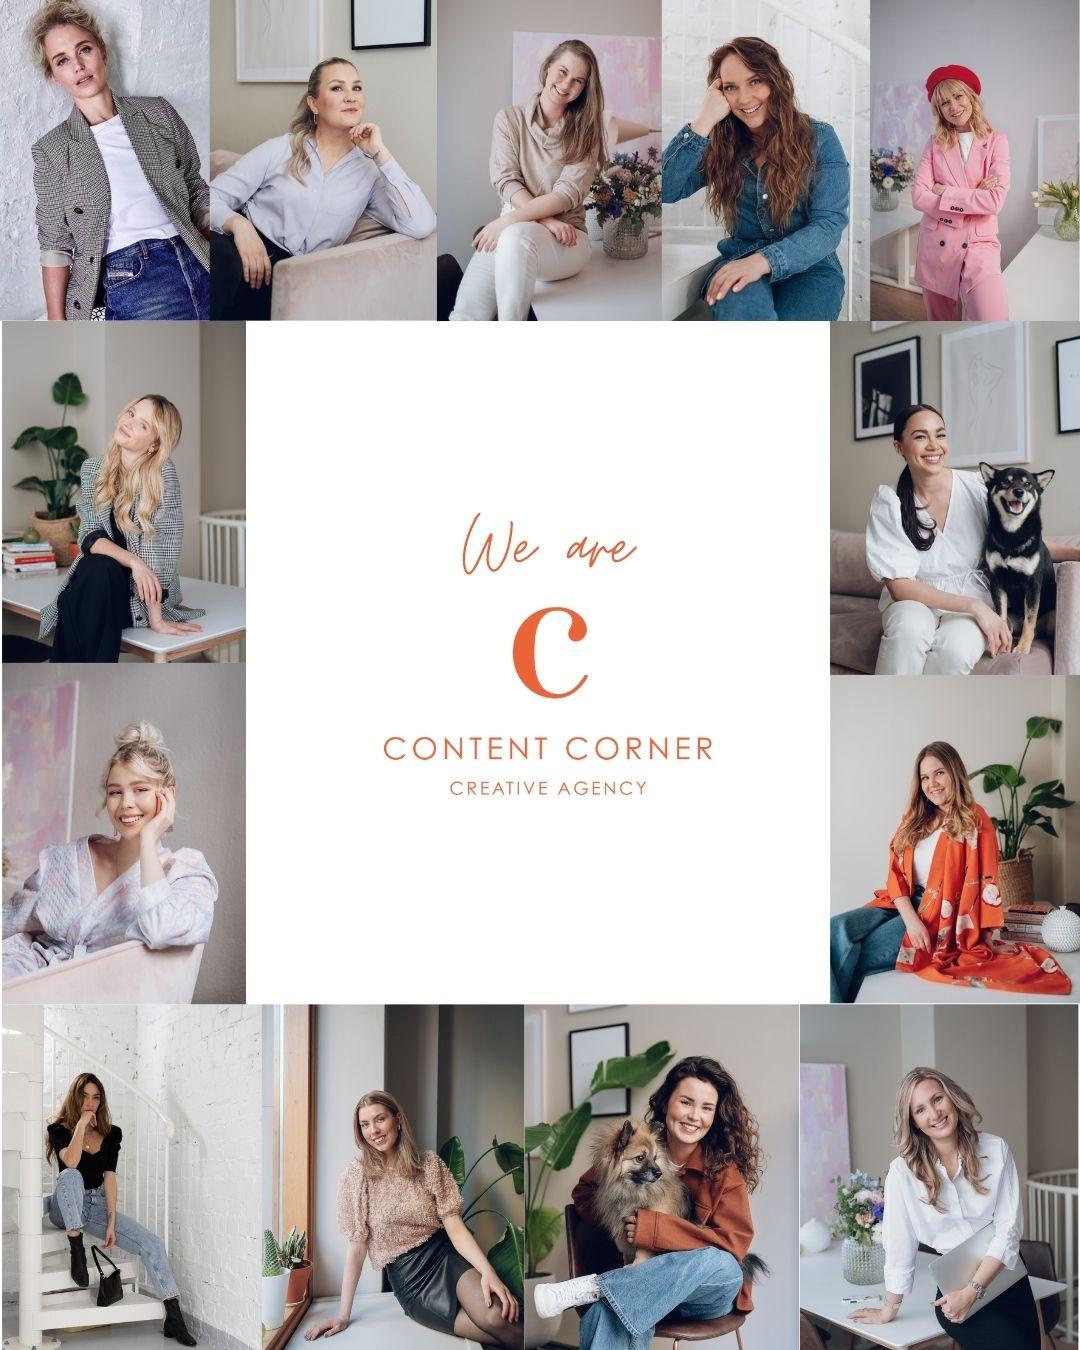 Content Corner - Creative Agency